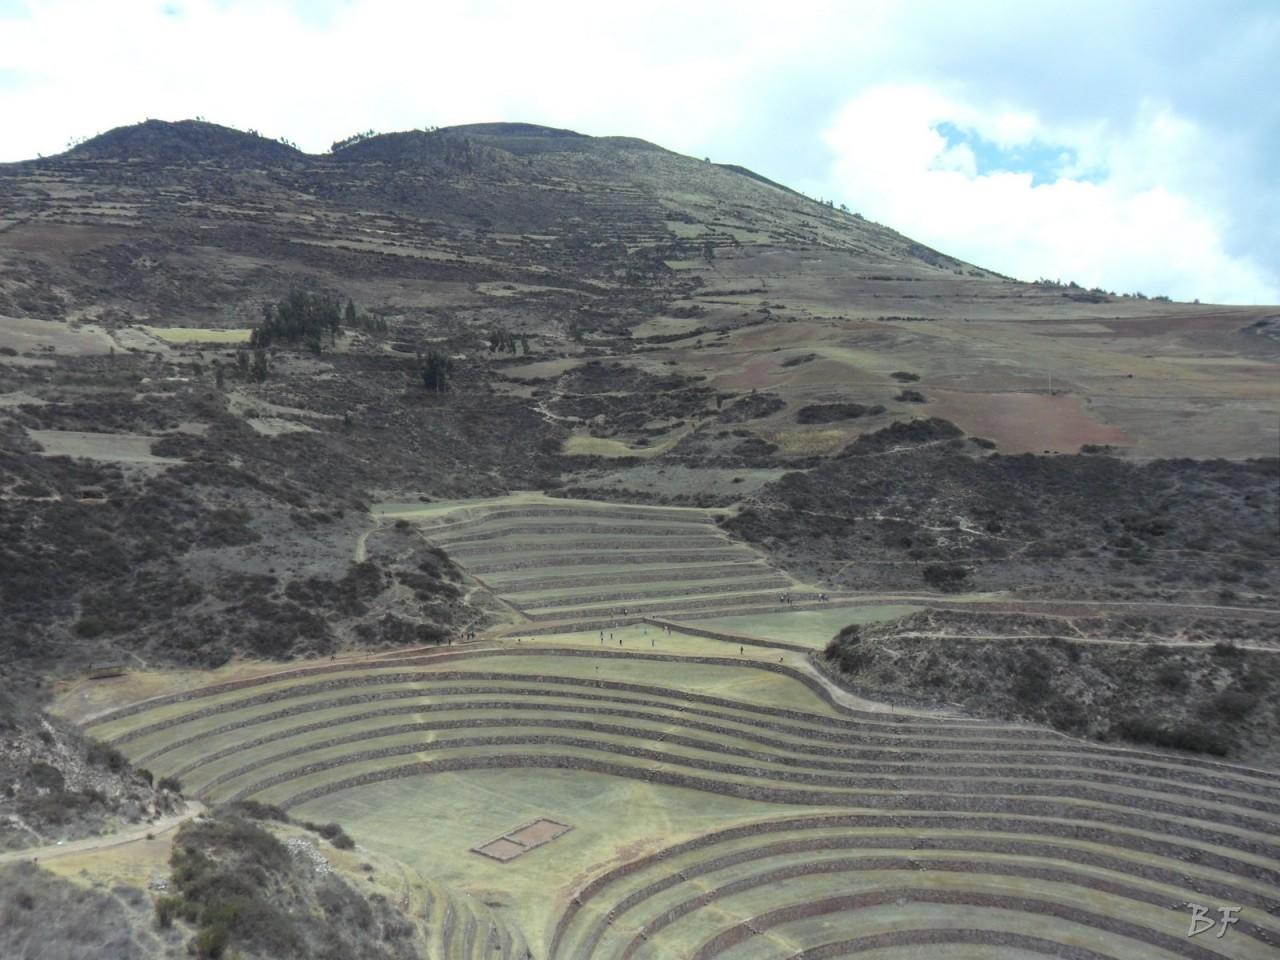 Terrazze-Circolari-Megaliti-Moray-Saline-Maras-Cusco-Perù-1